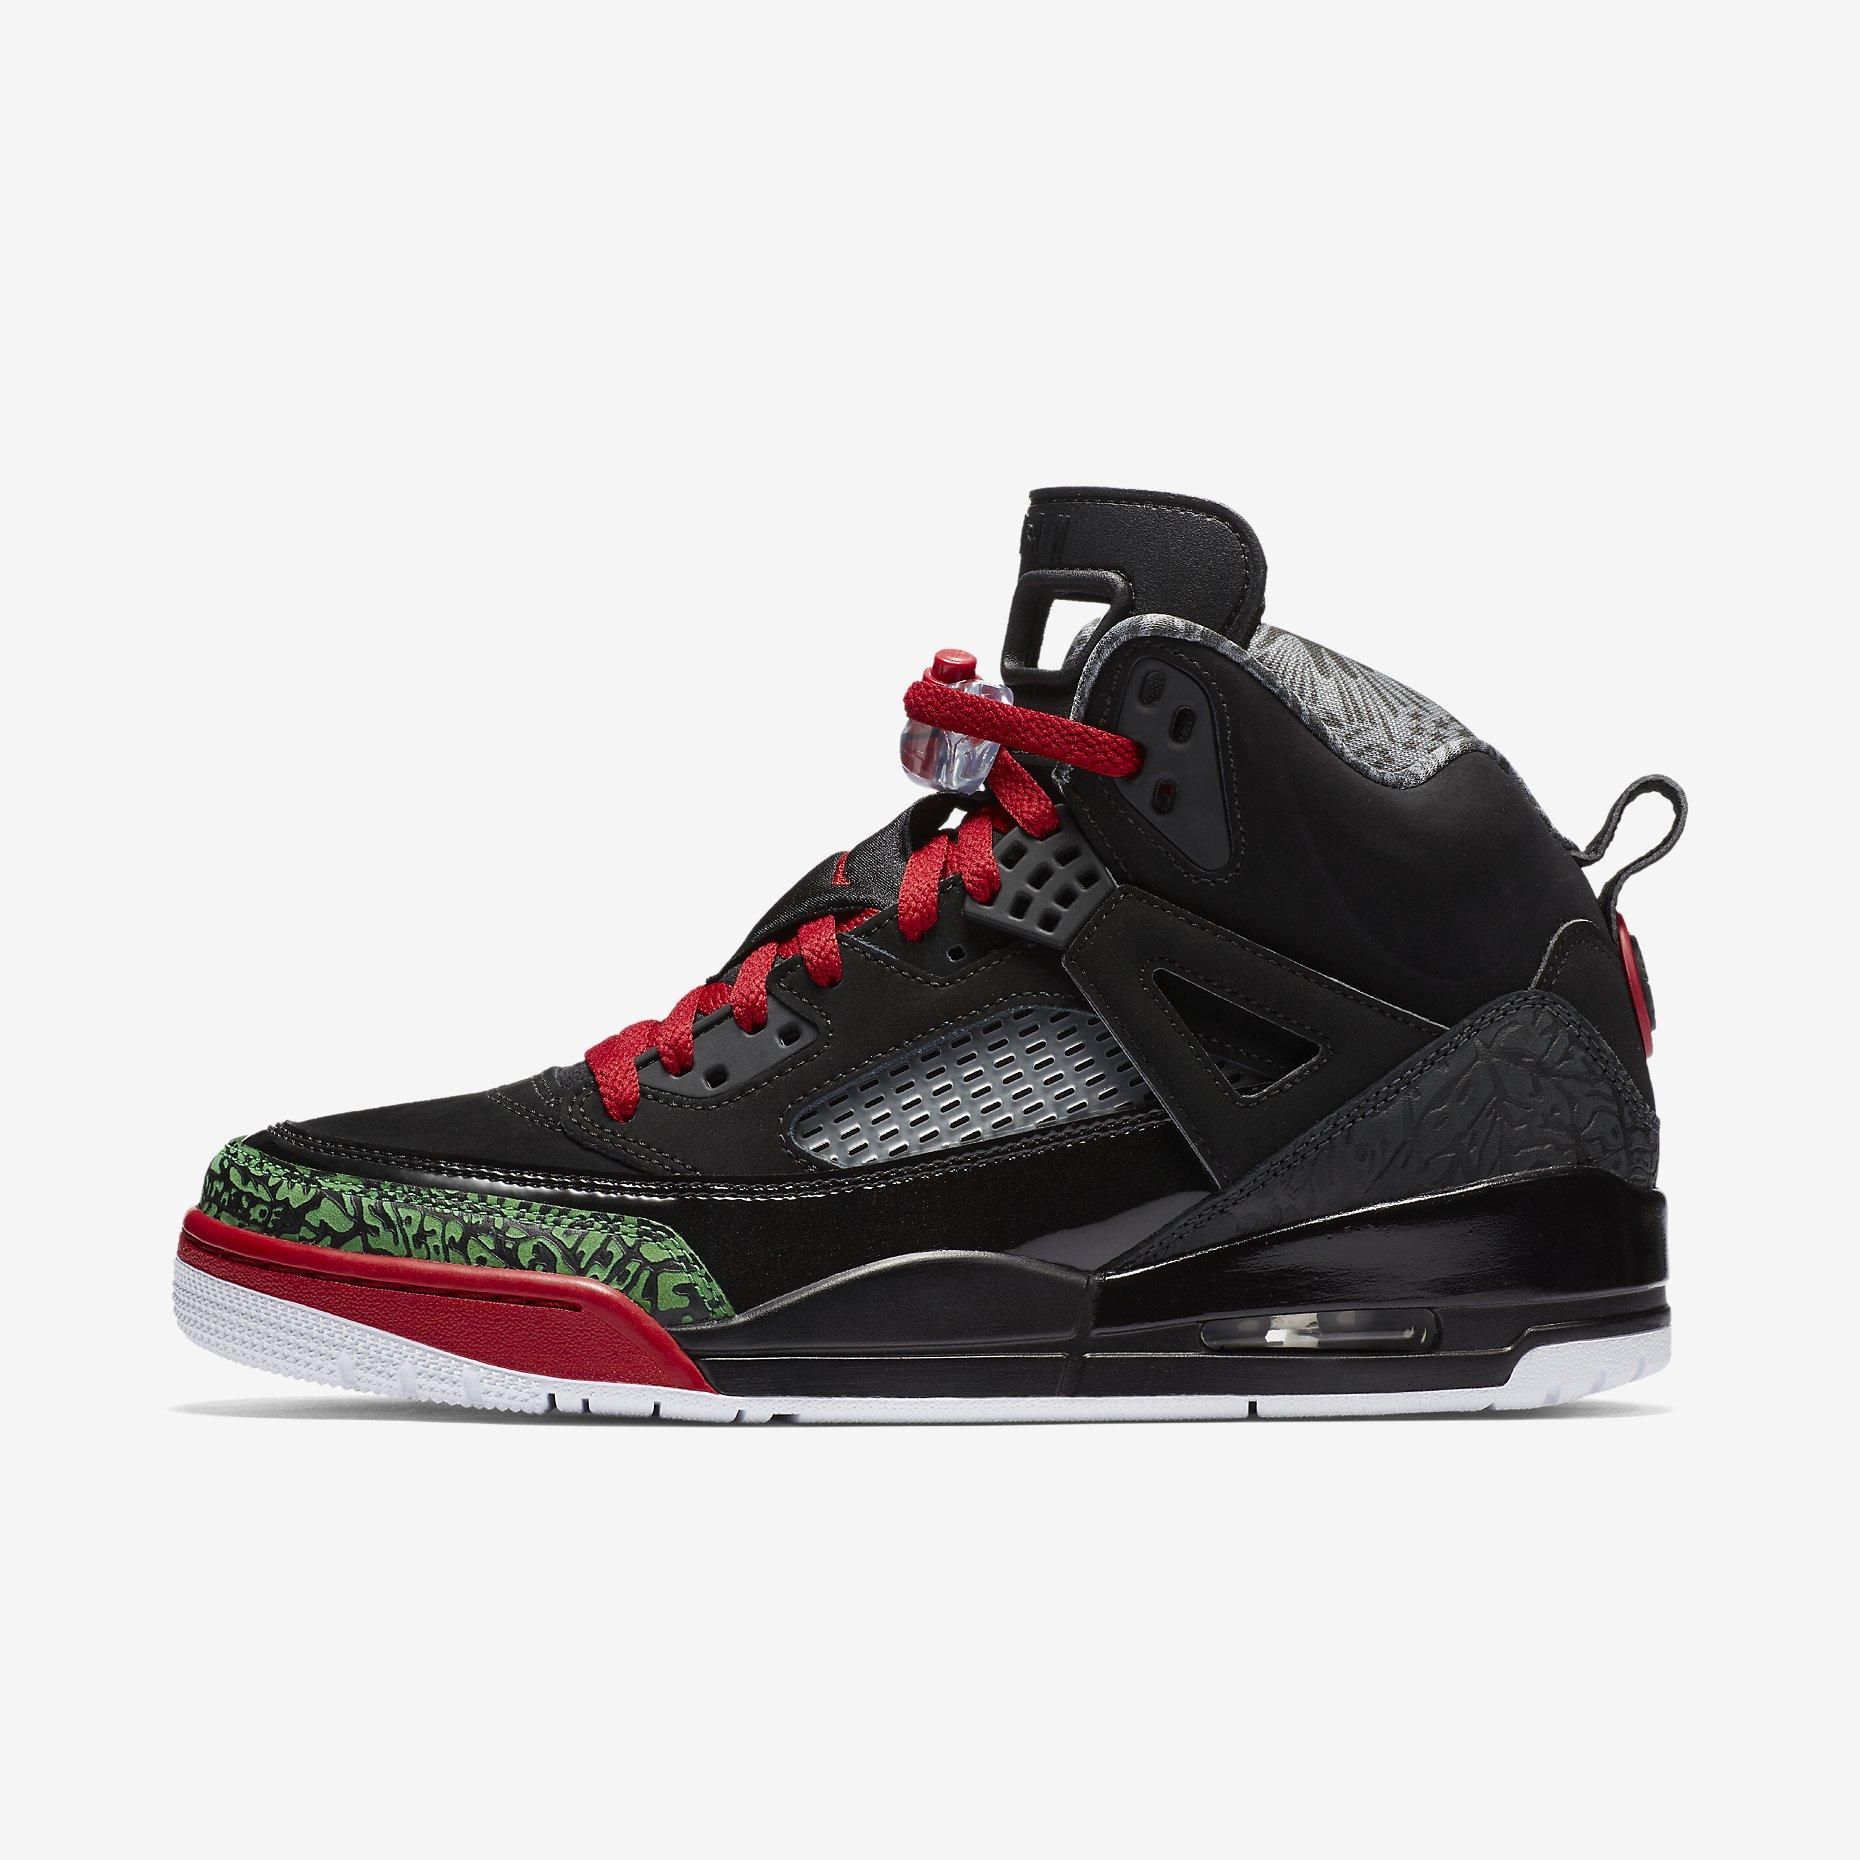 Jordan Spizike – Sneakerhead